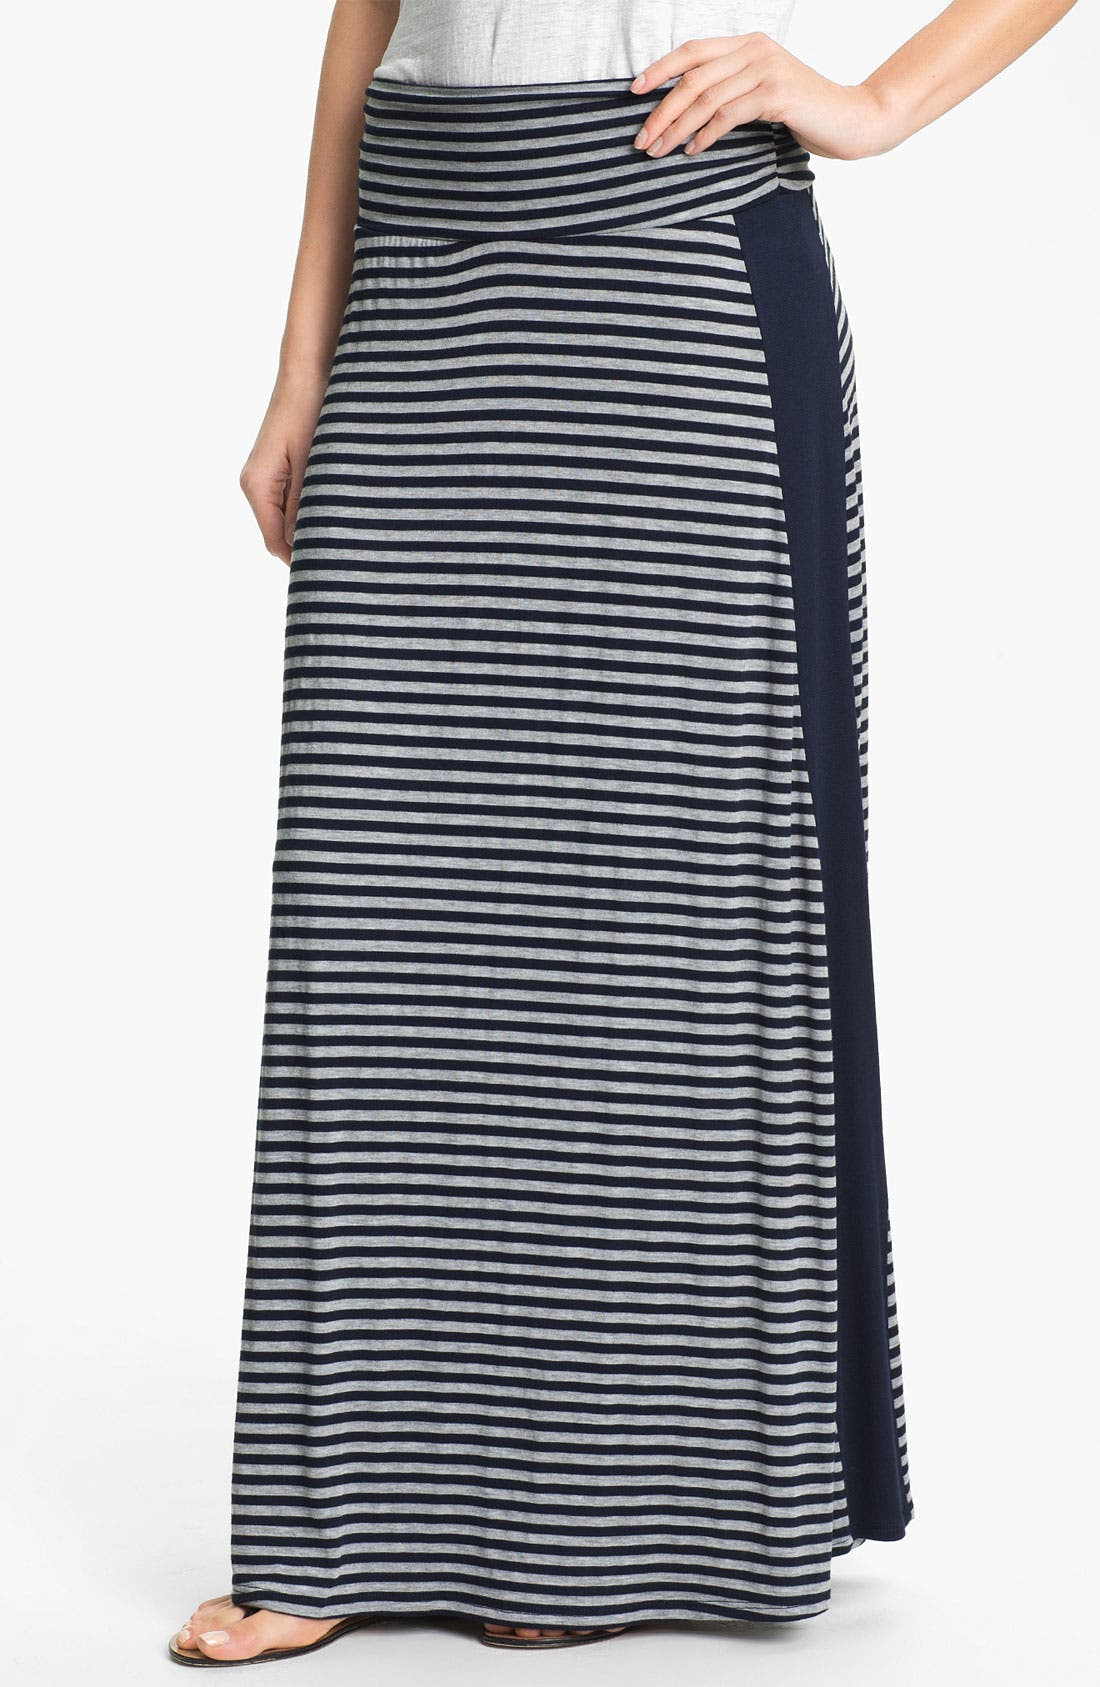 Alternate Image 1 Selected - Bobeau Tuxedo Stripe Maxi Skirt